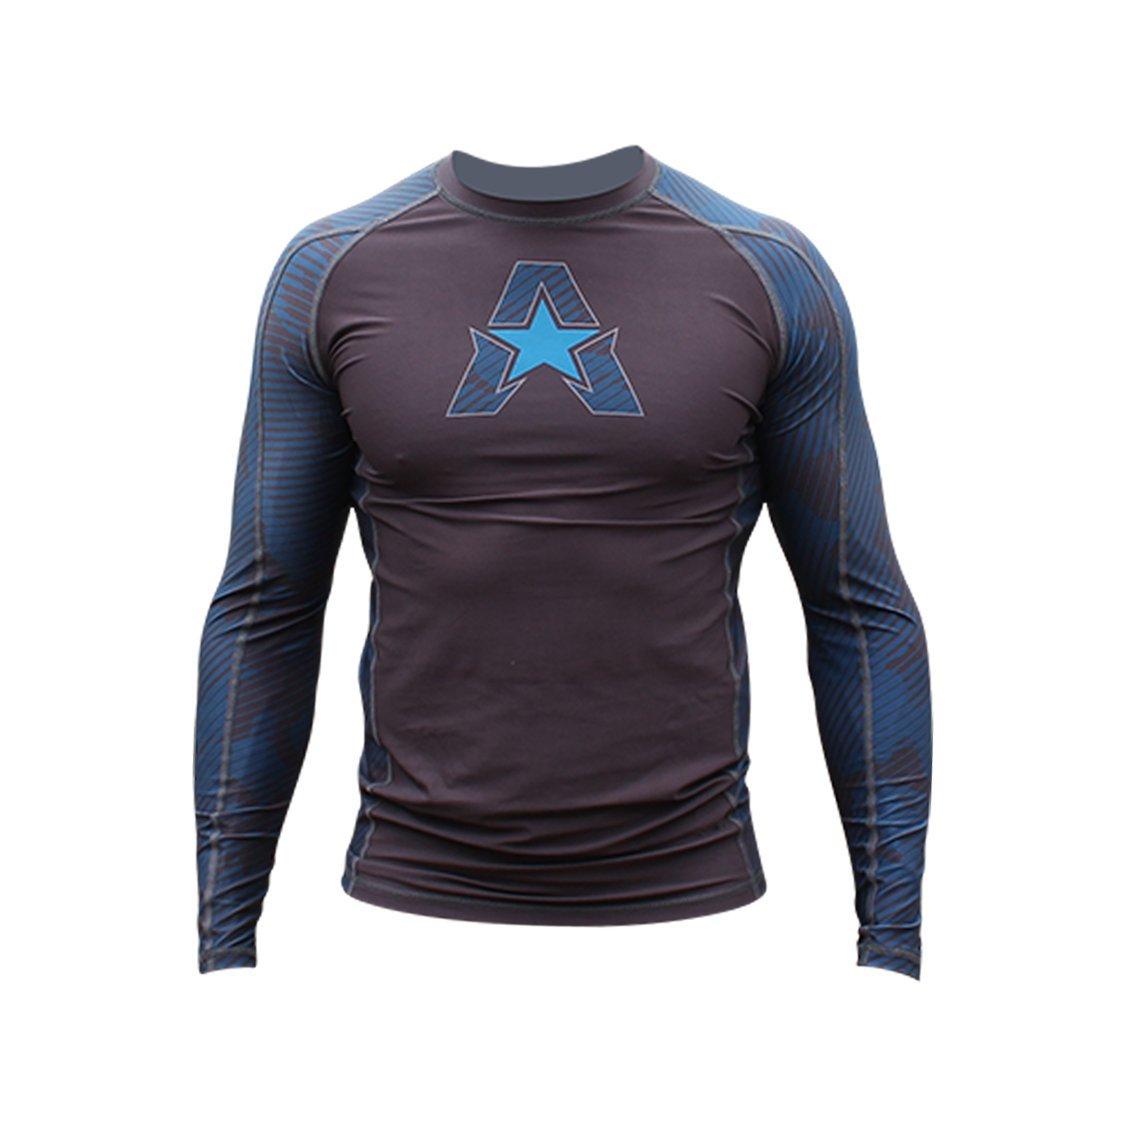 Anthem Athletics NEW! 10+ Styles HELO-X Long Sleeve Rash Guard Compression Shirt - BJJ, MMA, Muay Thai - Marine Line Camo - Medium